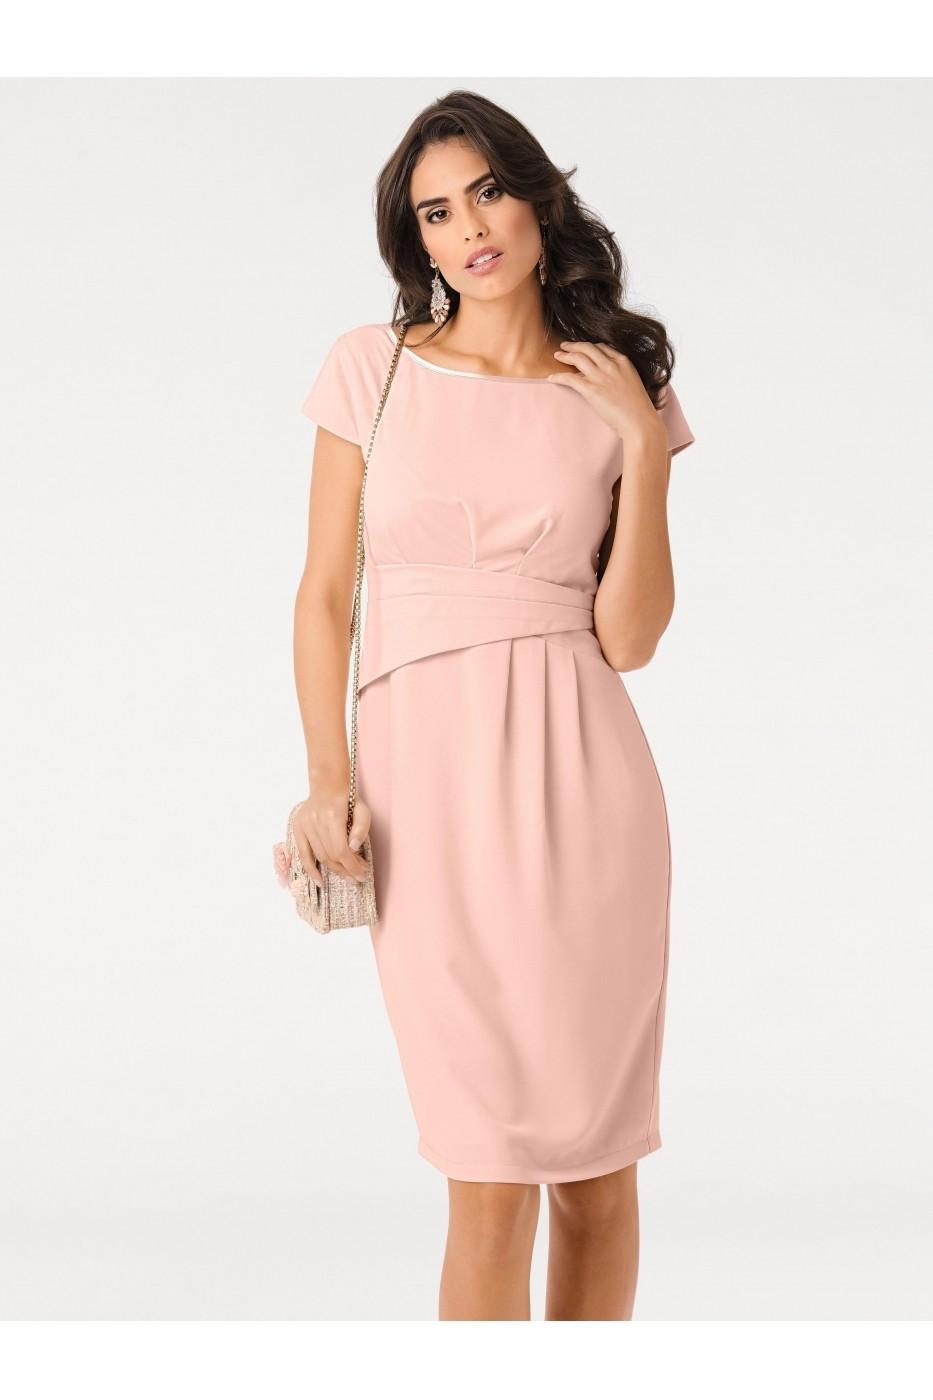 c145849ab4 Estélyi ruha heine TIMELESS 5022 Rózsaszín - FashionUP!